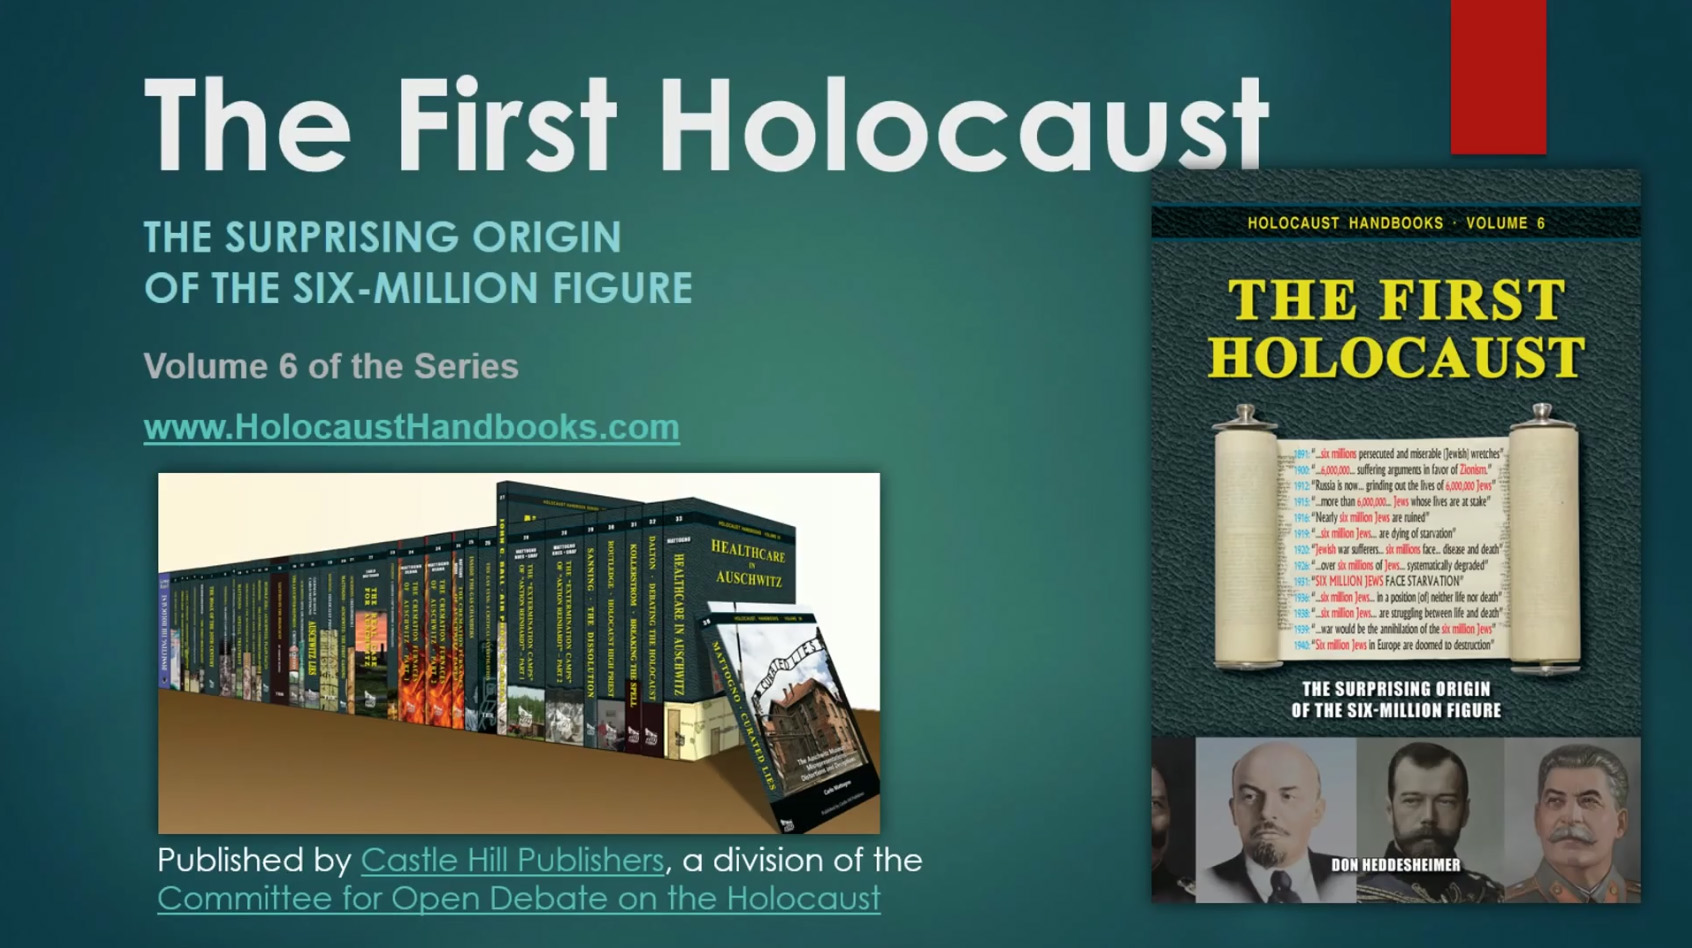 debating the holocaust